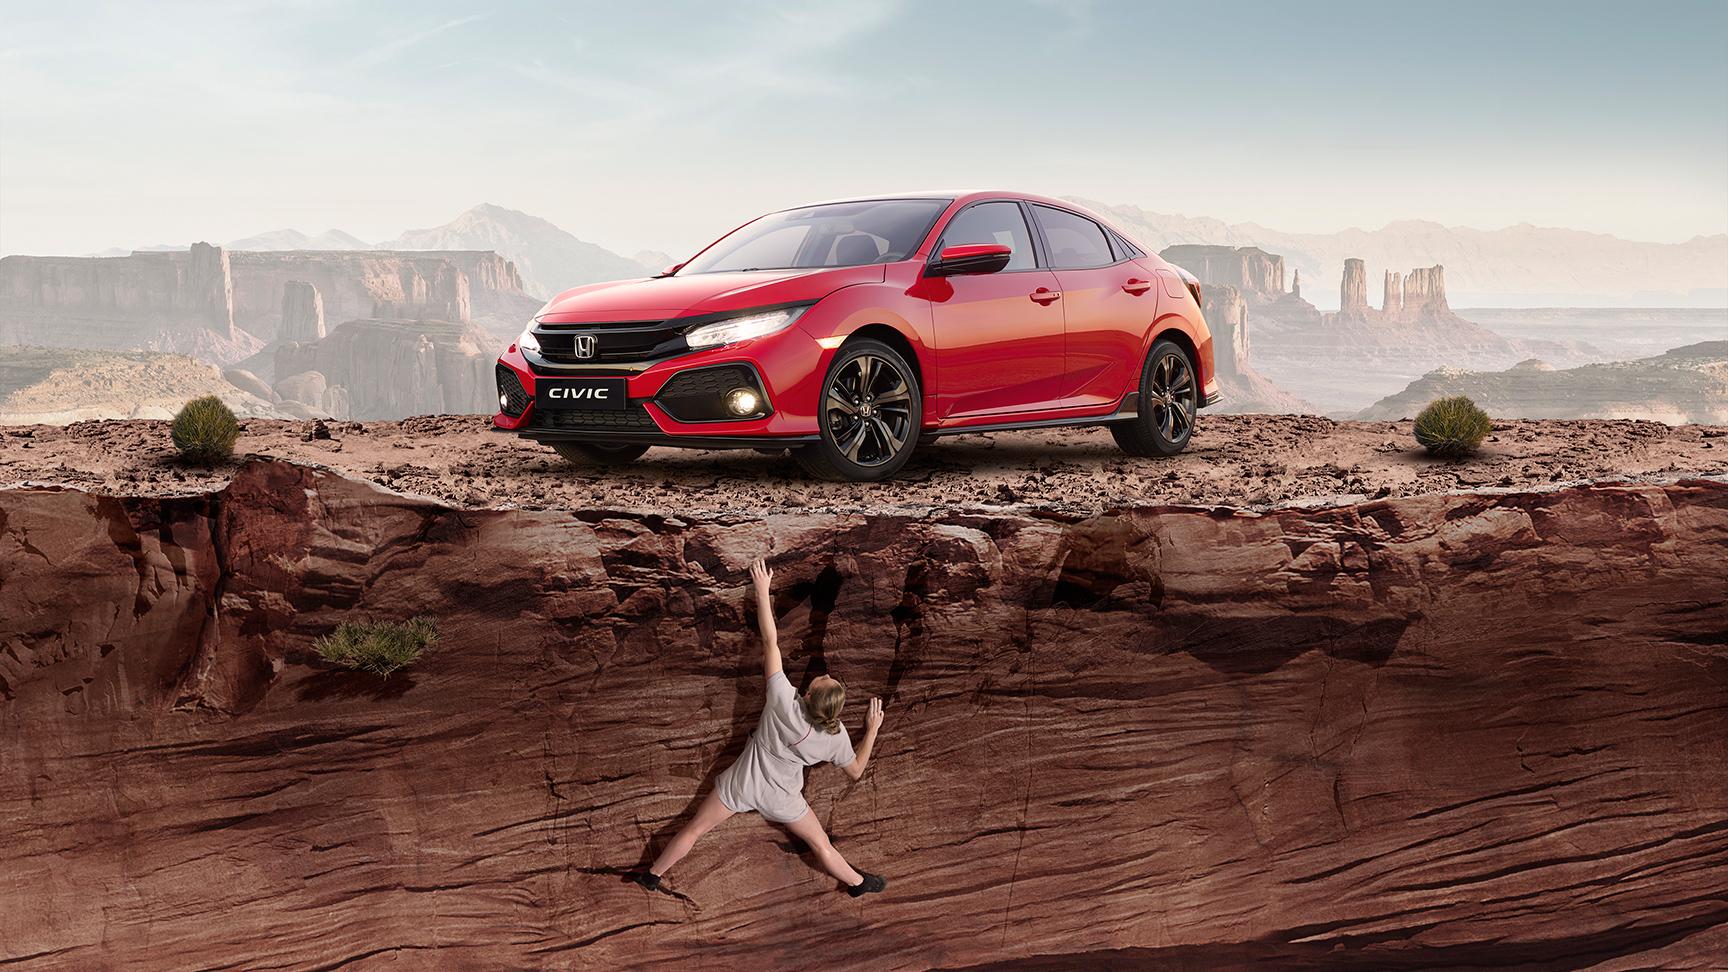 Honda Motor Europe Launches 48-hour Virtual Honda Civic Treasure Hunt